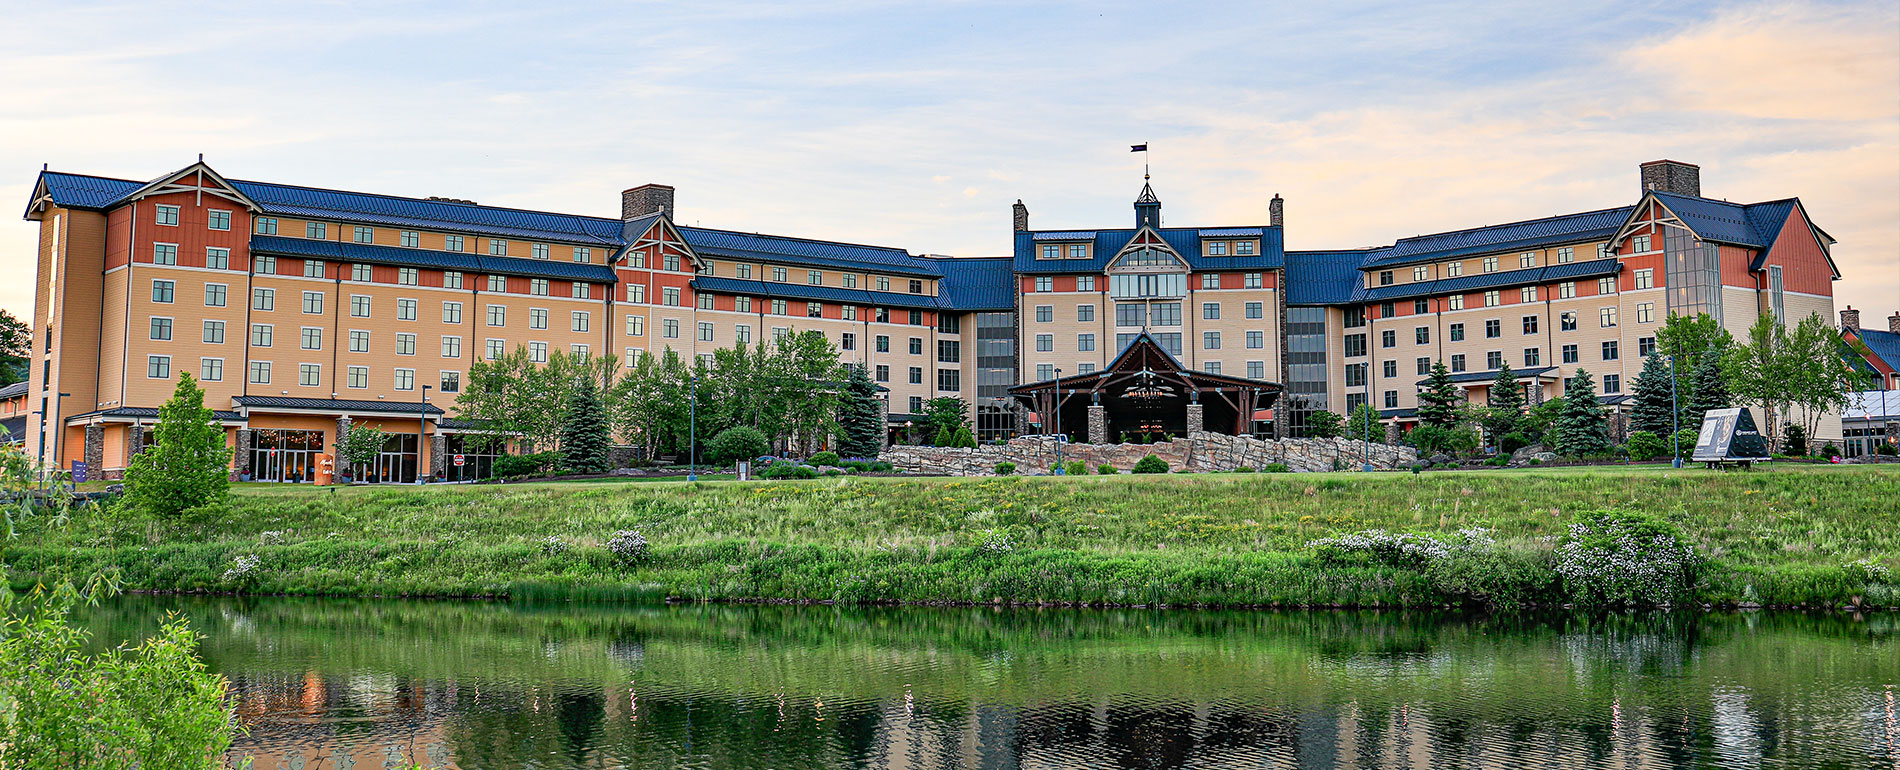 mt Pocono hotel casino spa exterior 2020